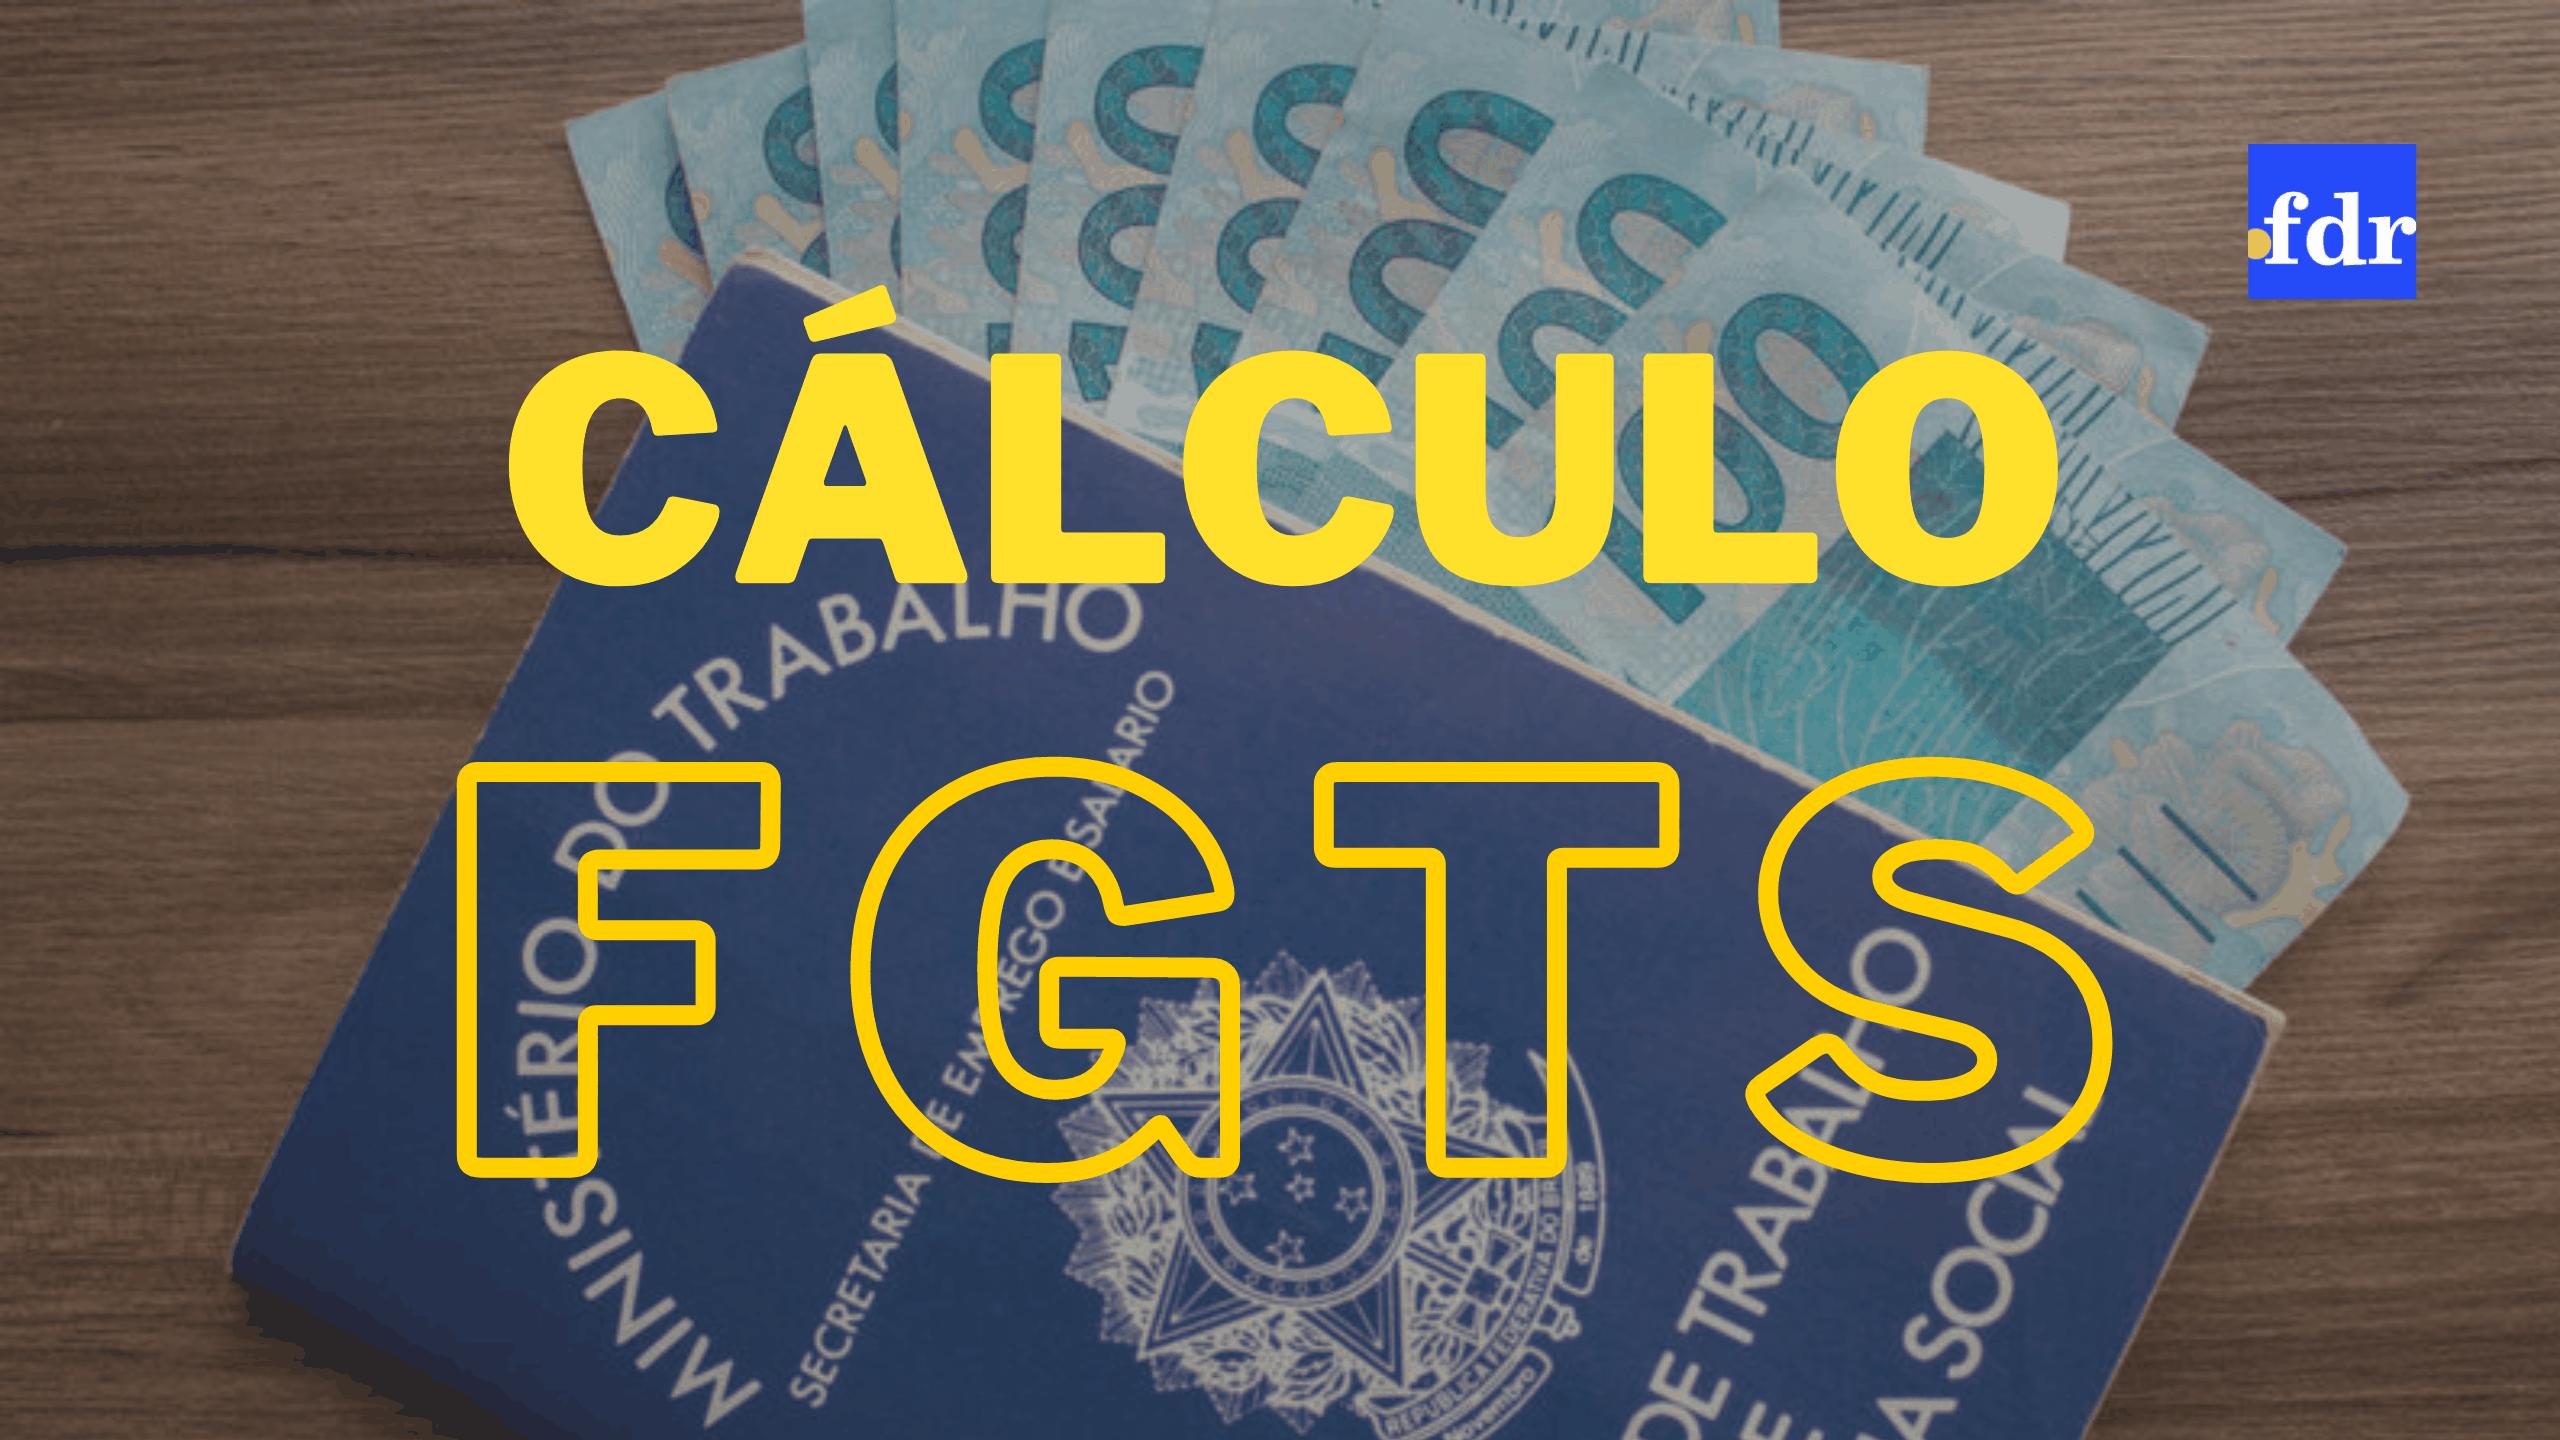 Saque do FGTS: Calcule valor das parcelas liberadas na modalidade aniversário